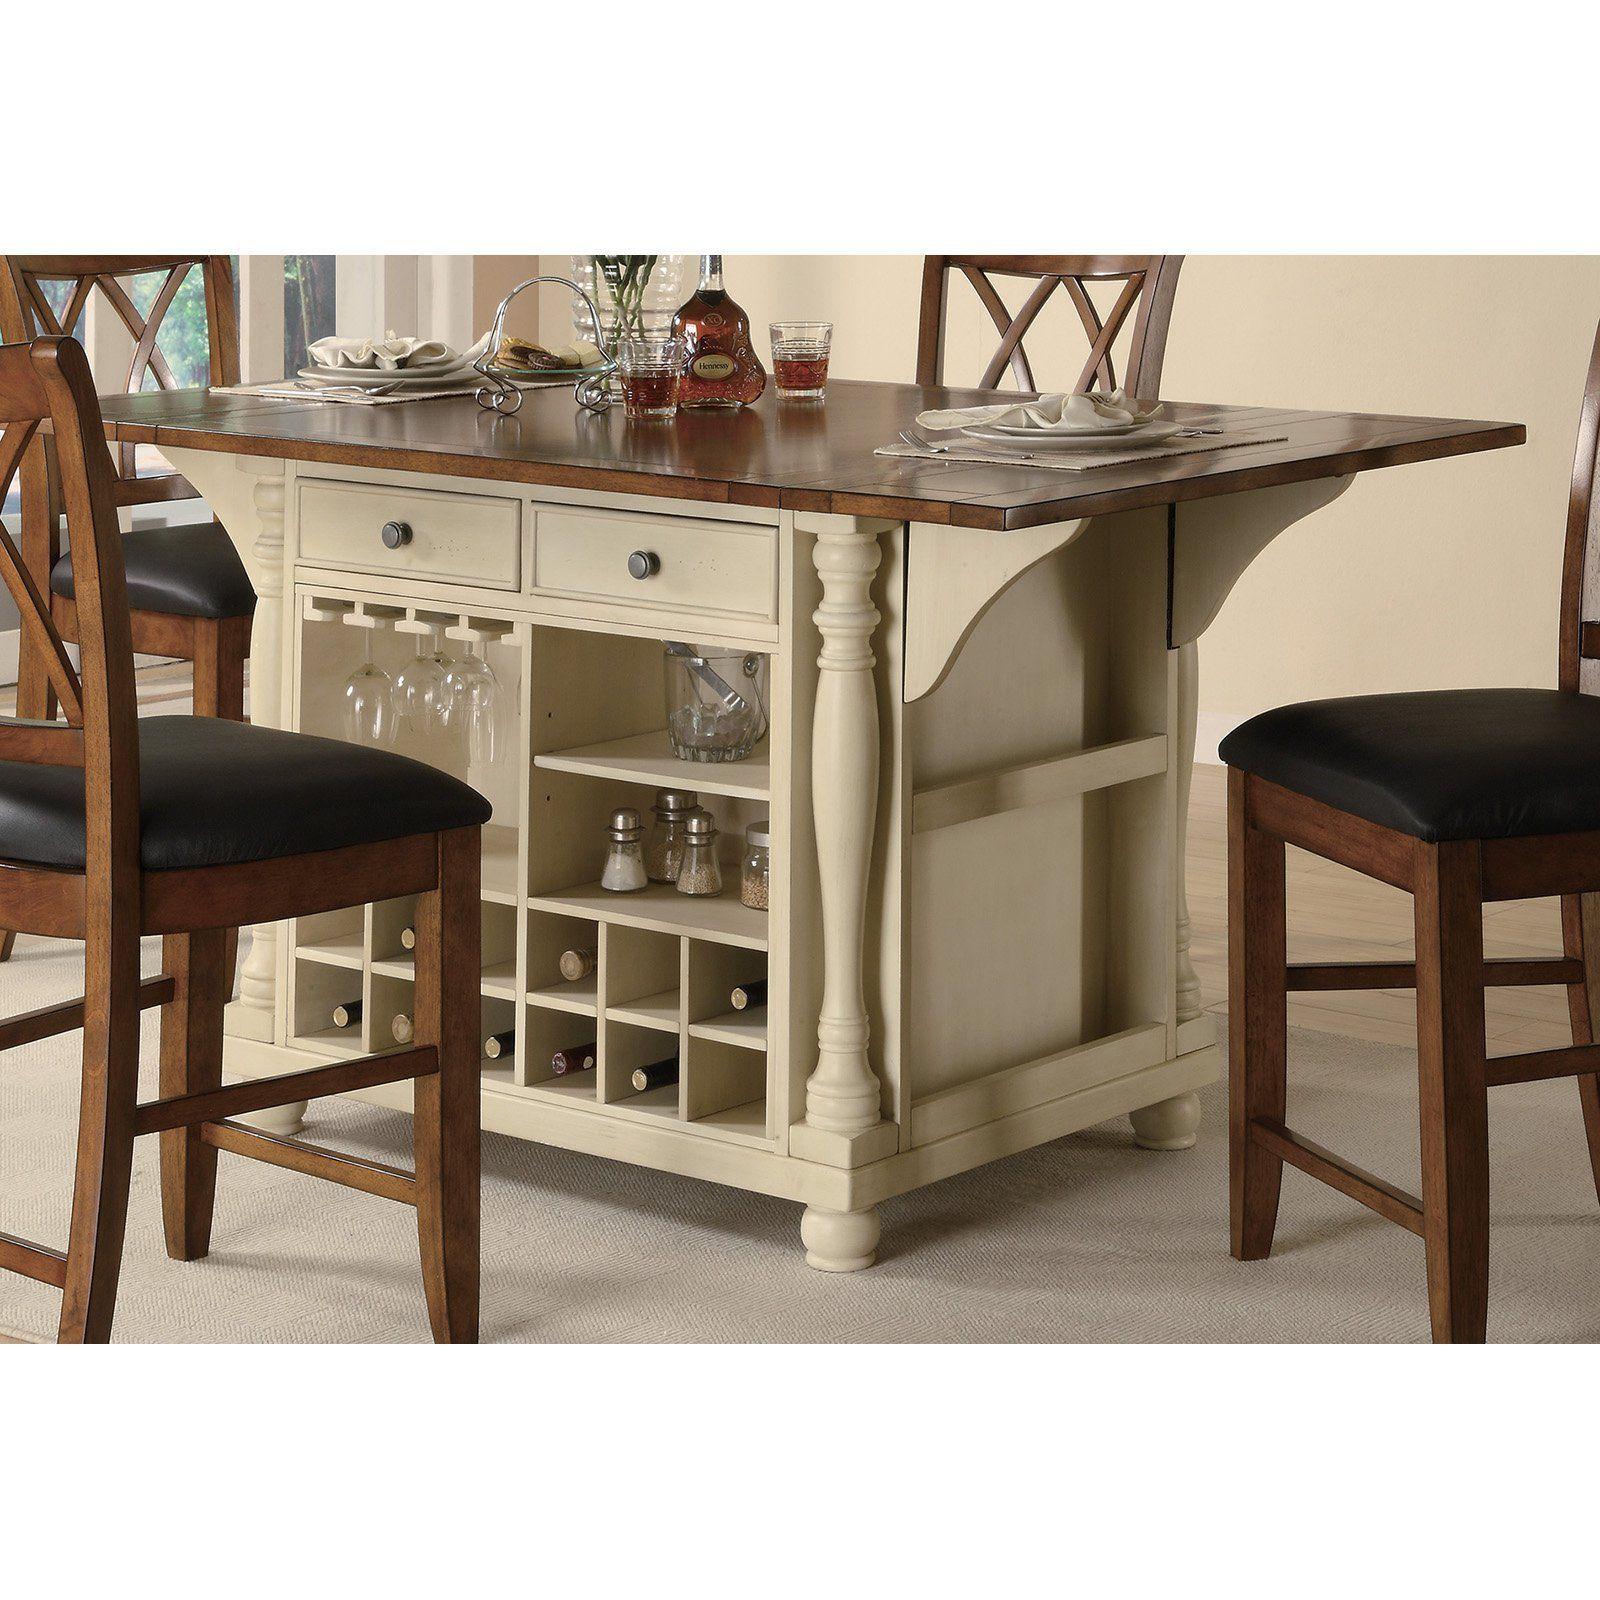 coaster furniture stationary kitchen island from hayneedle com coaster furniture stationary kitchen island from hayneedle com